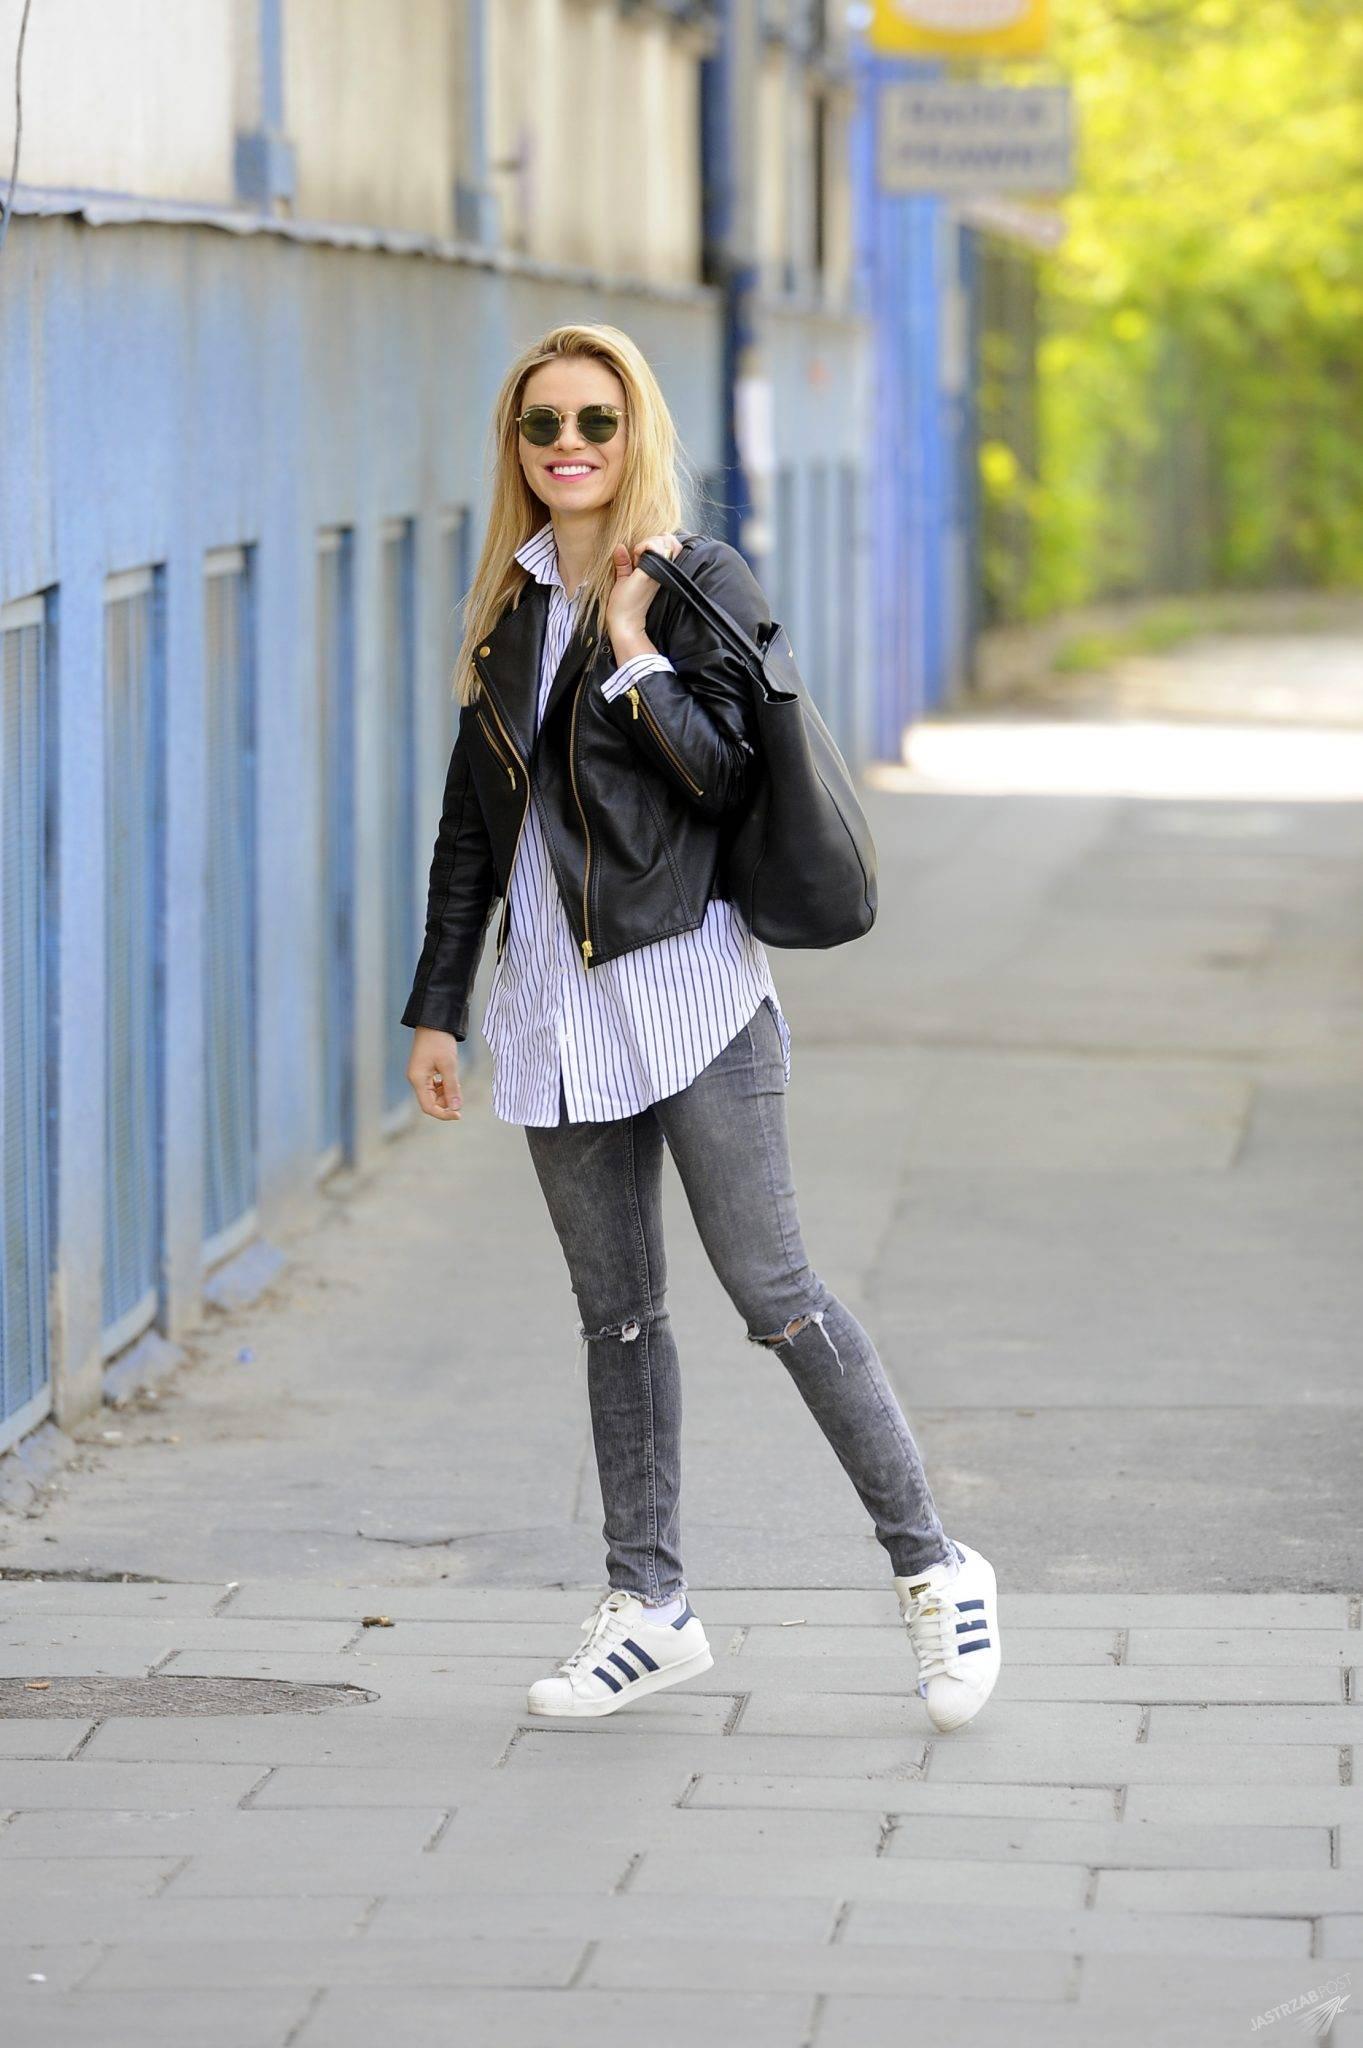 Natasza Urbańska wraca na studia